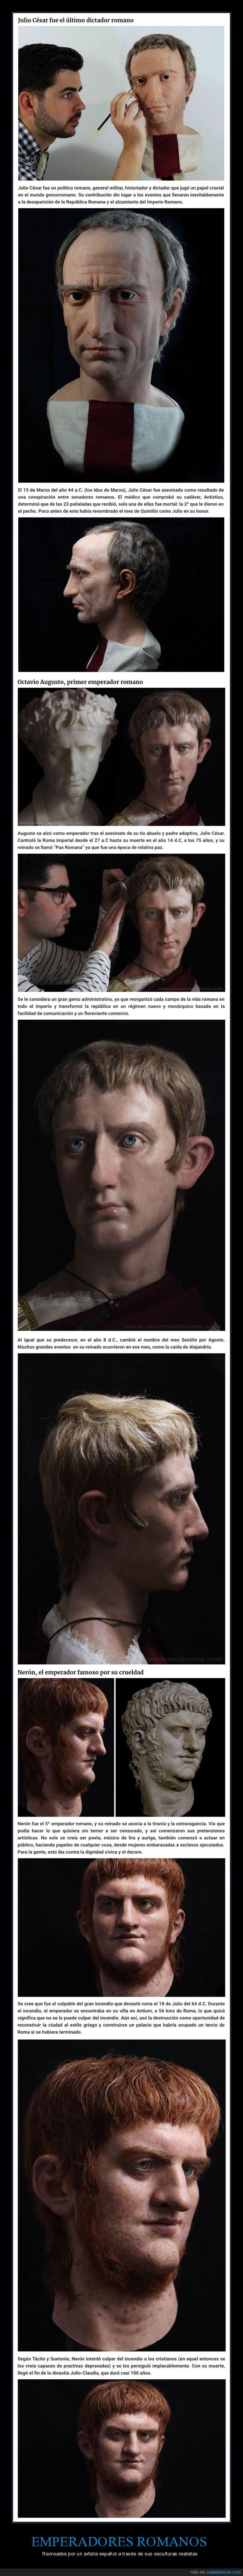 emperadores romanos,esculturas,realistas,roma